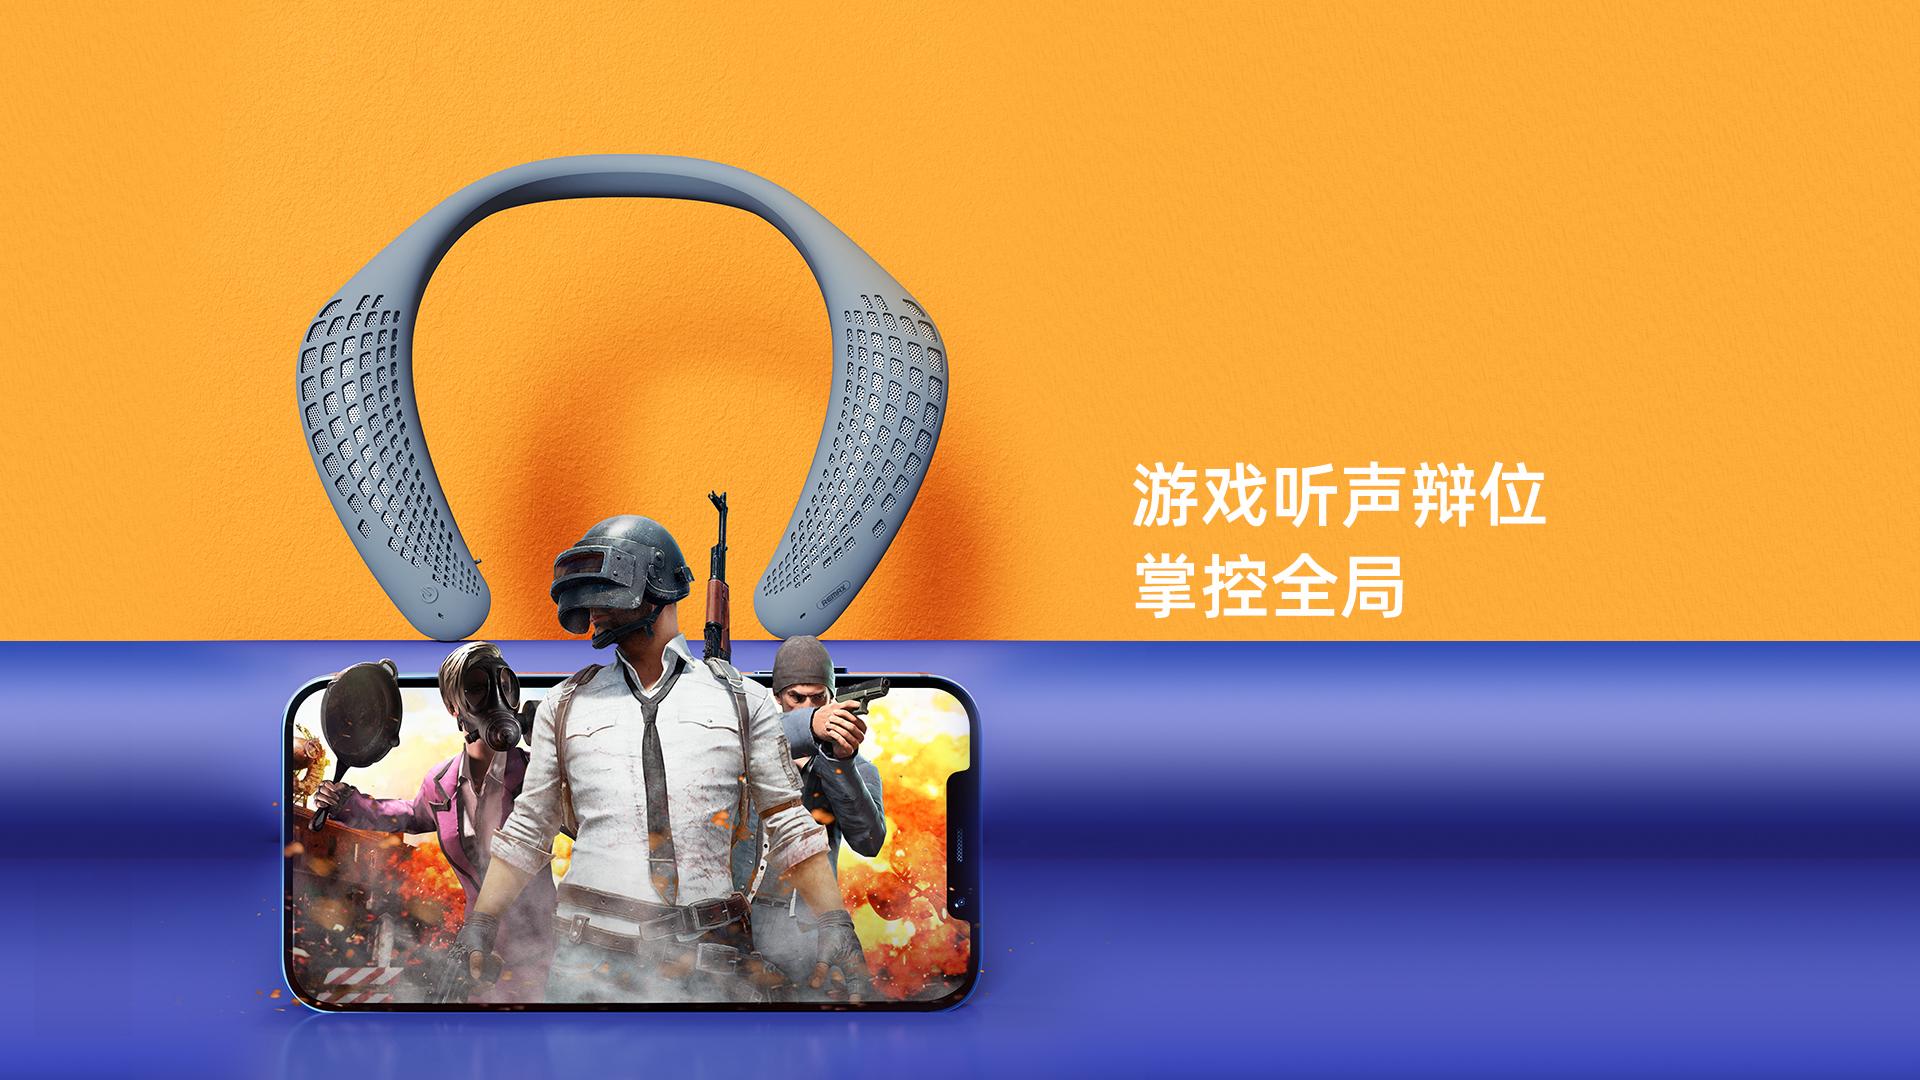 M42-酷乐挂脖蓝牙音箱网页_04